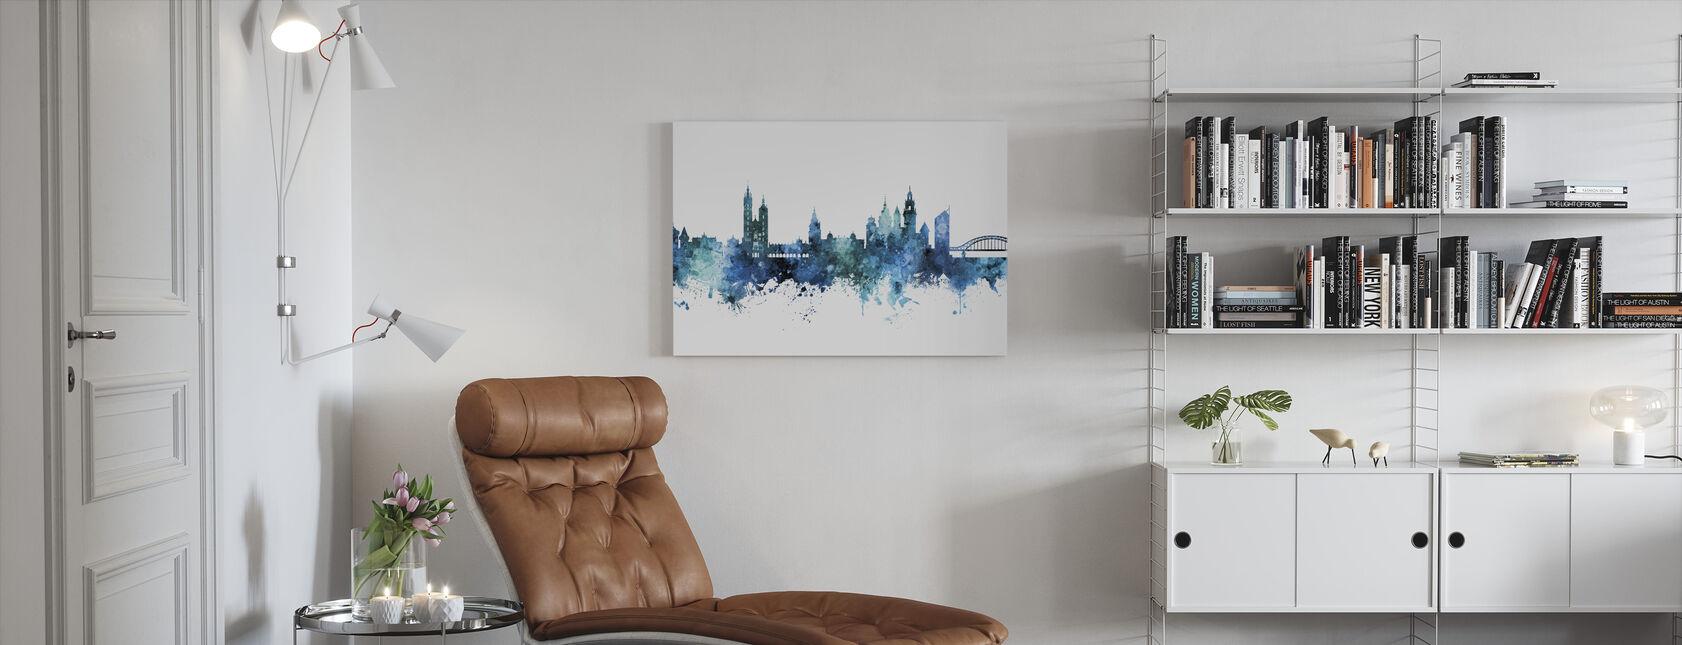 Krakow Polska Panorama - Obraz na płótnie - Pokój dzienny